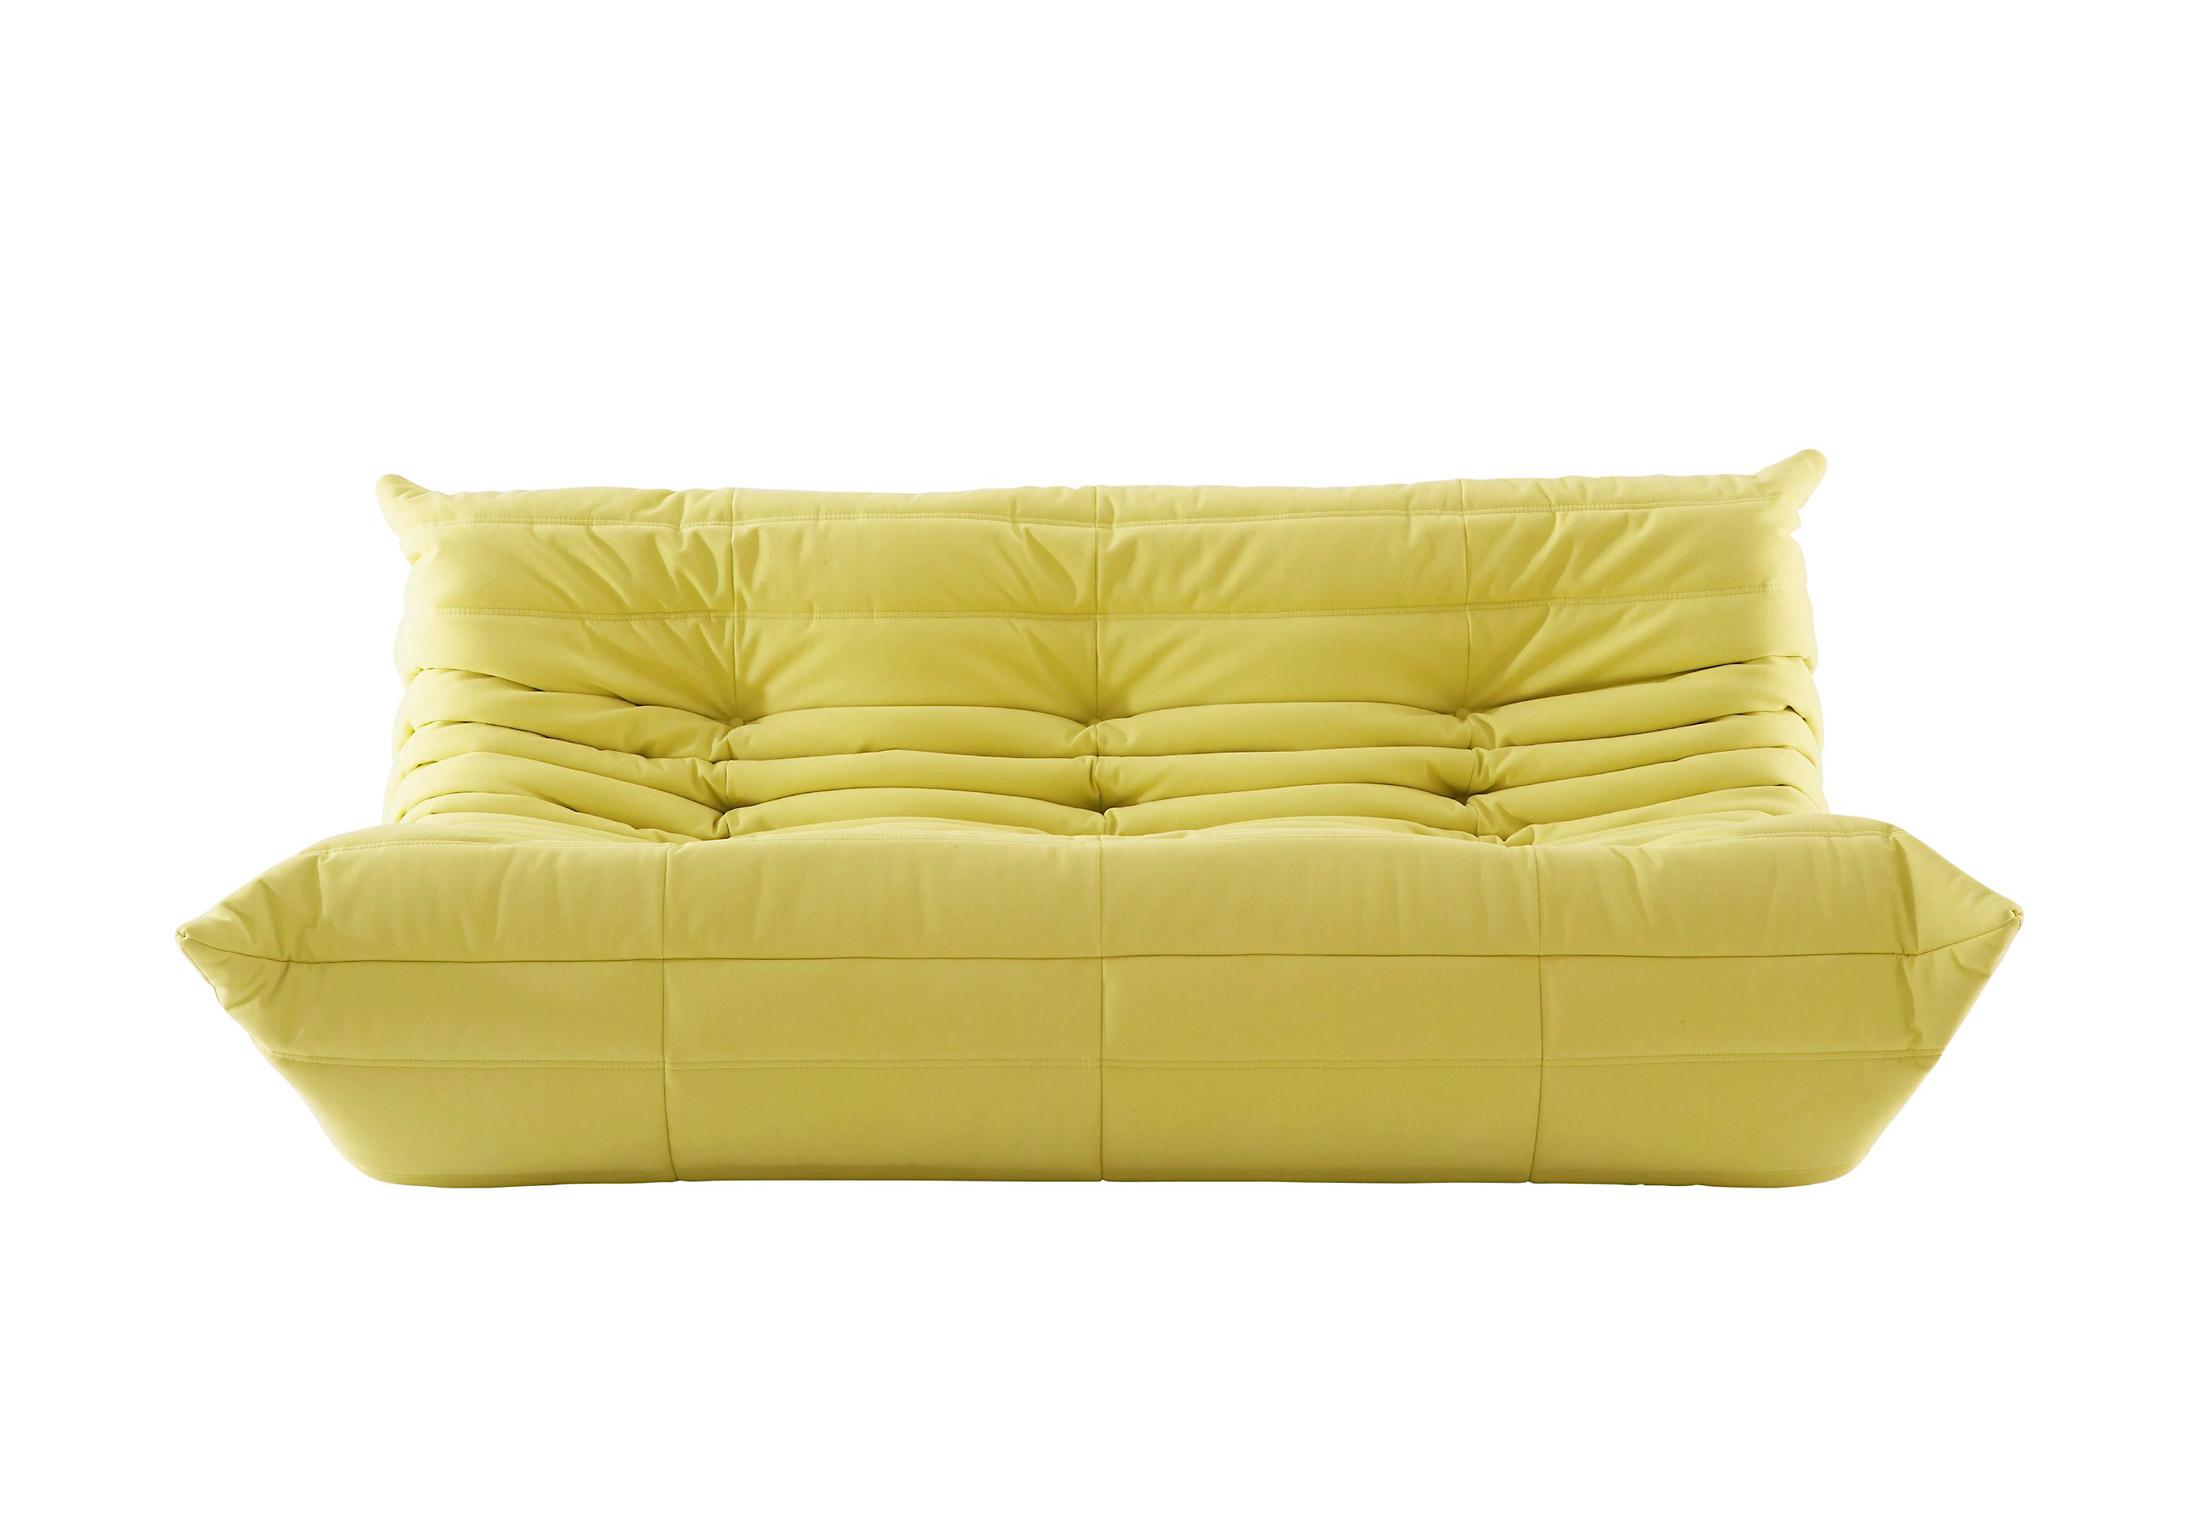 Togo Sofa 3 Sitzer Von Ligne Roset Stylepark